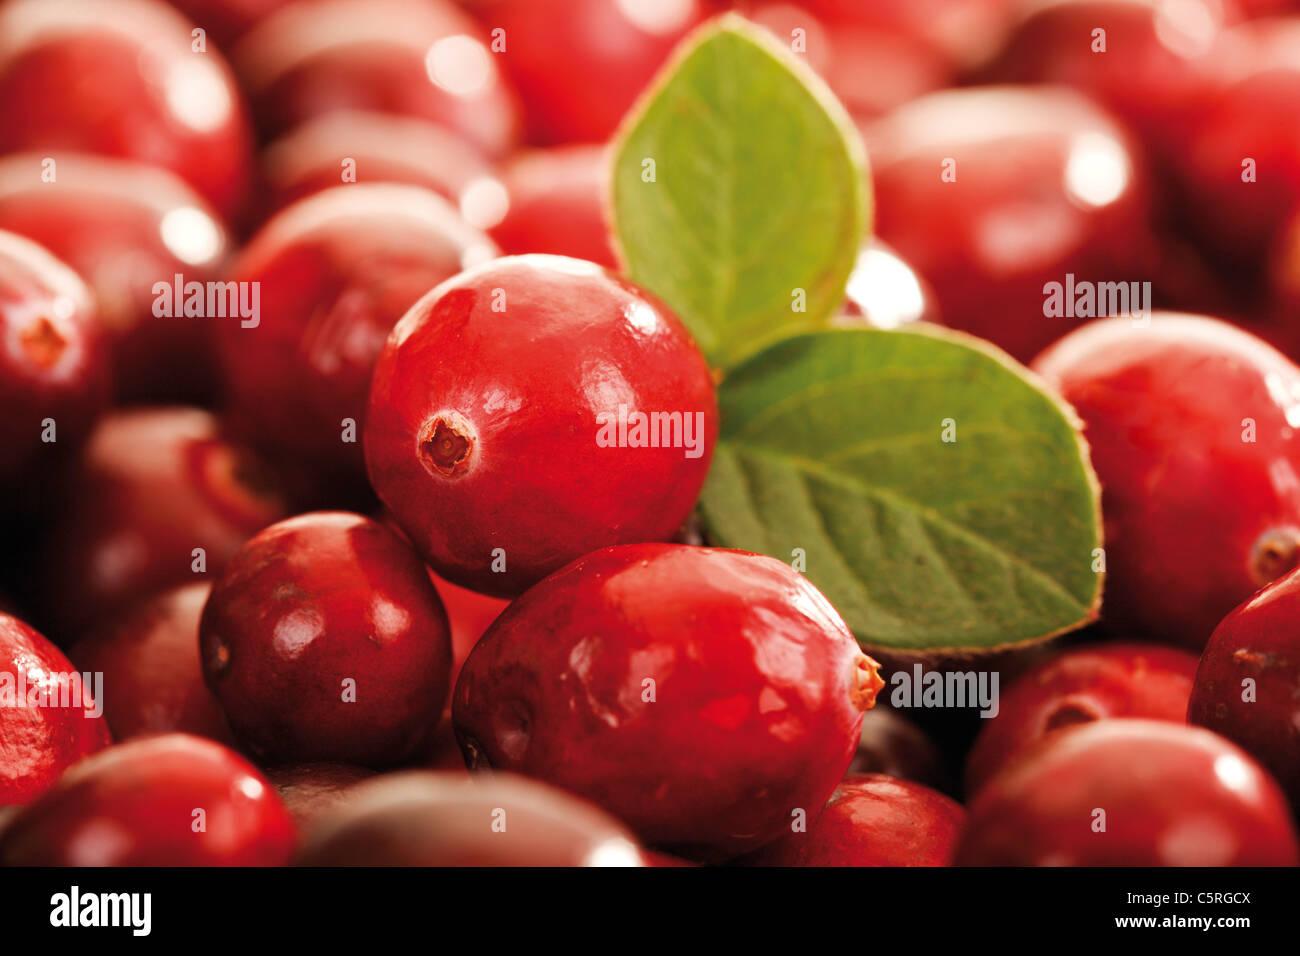 Cranberries (Vaccinium macrocarpon), full frame, close-up - Stock Image